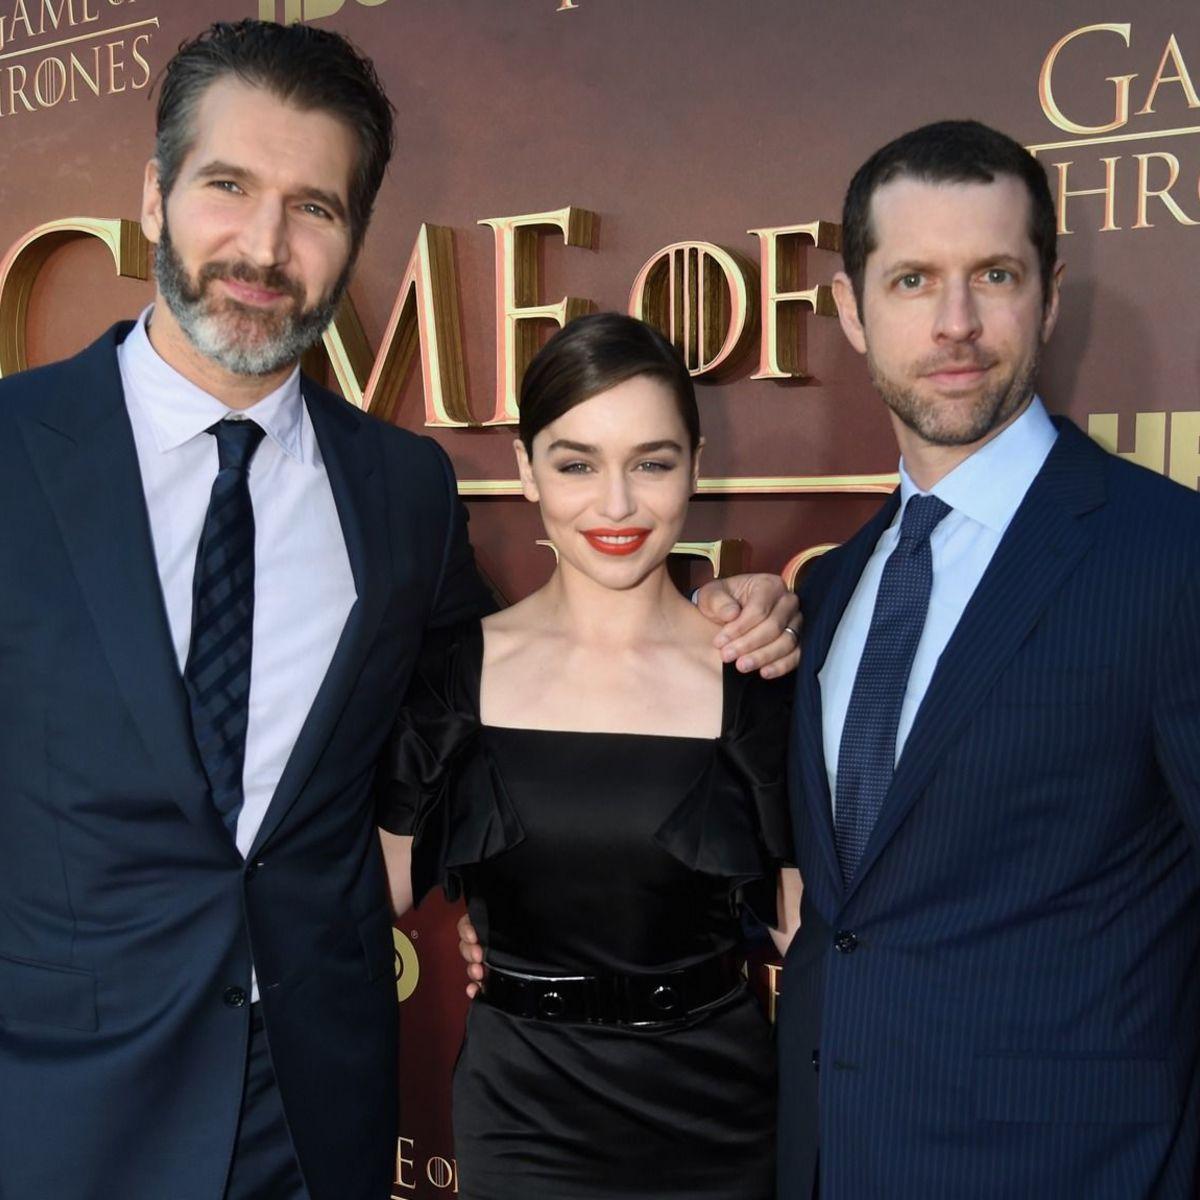 David Benioff Emilia Clarke DB Weiss